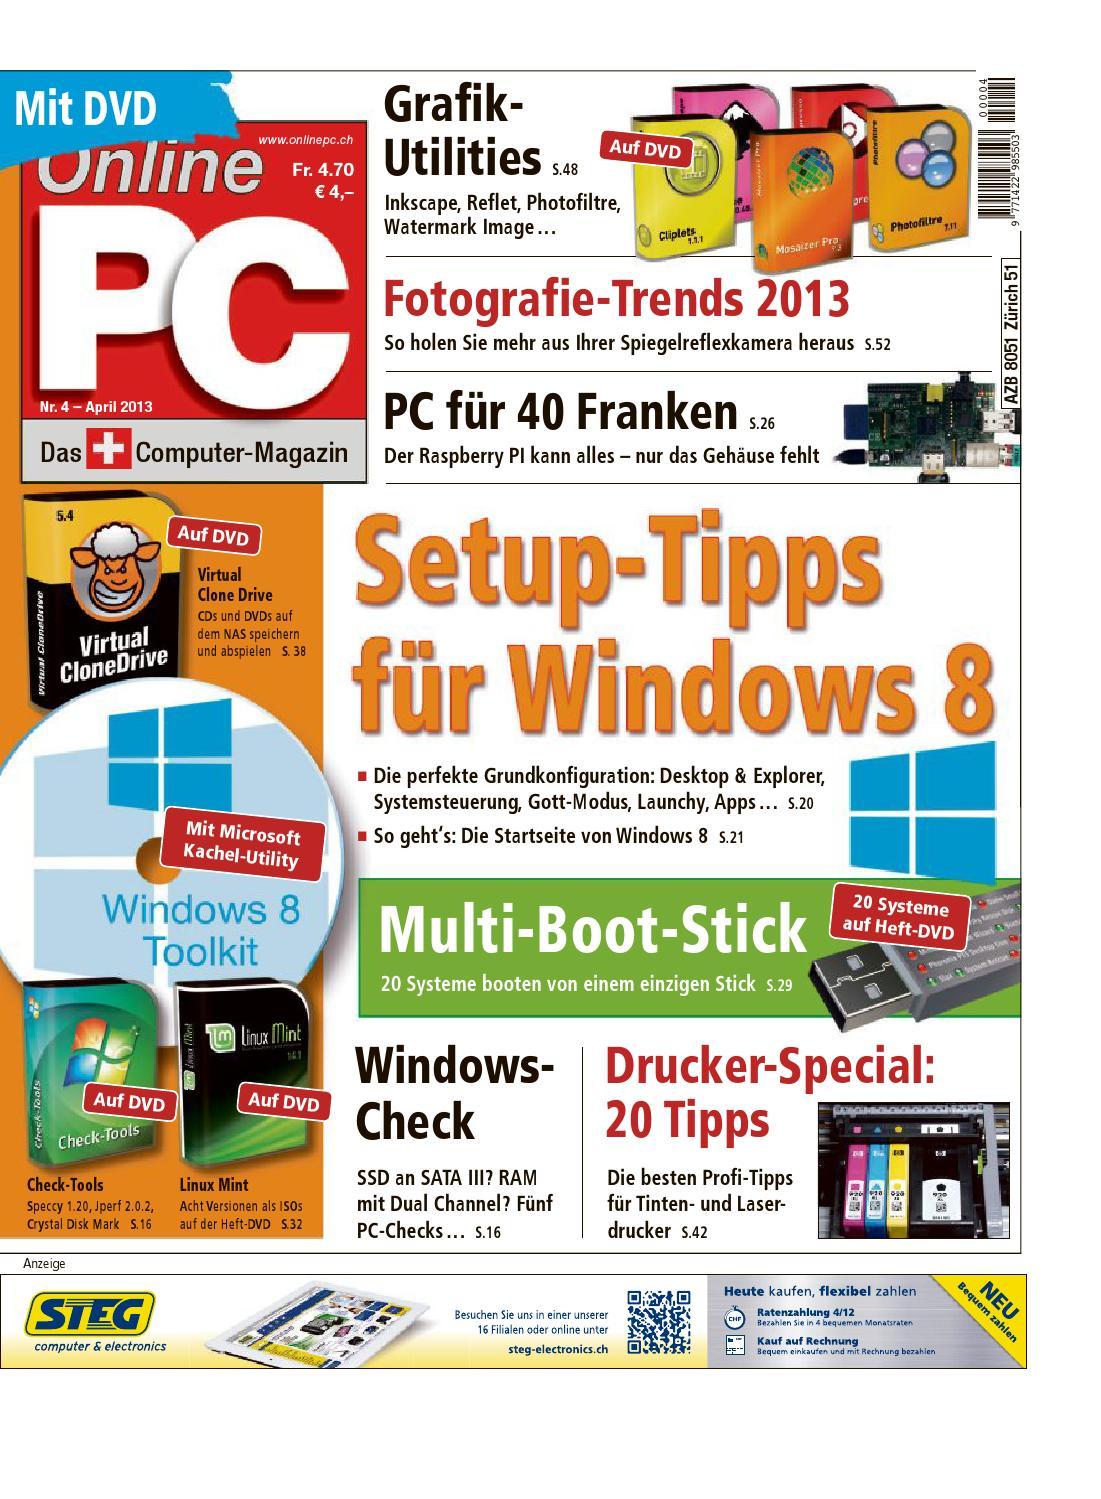 Online PC Magazin 04 2013 by Neue Mediengesellschaft Ulm - issuu